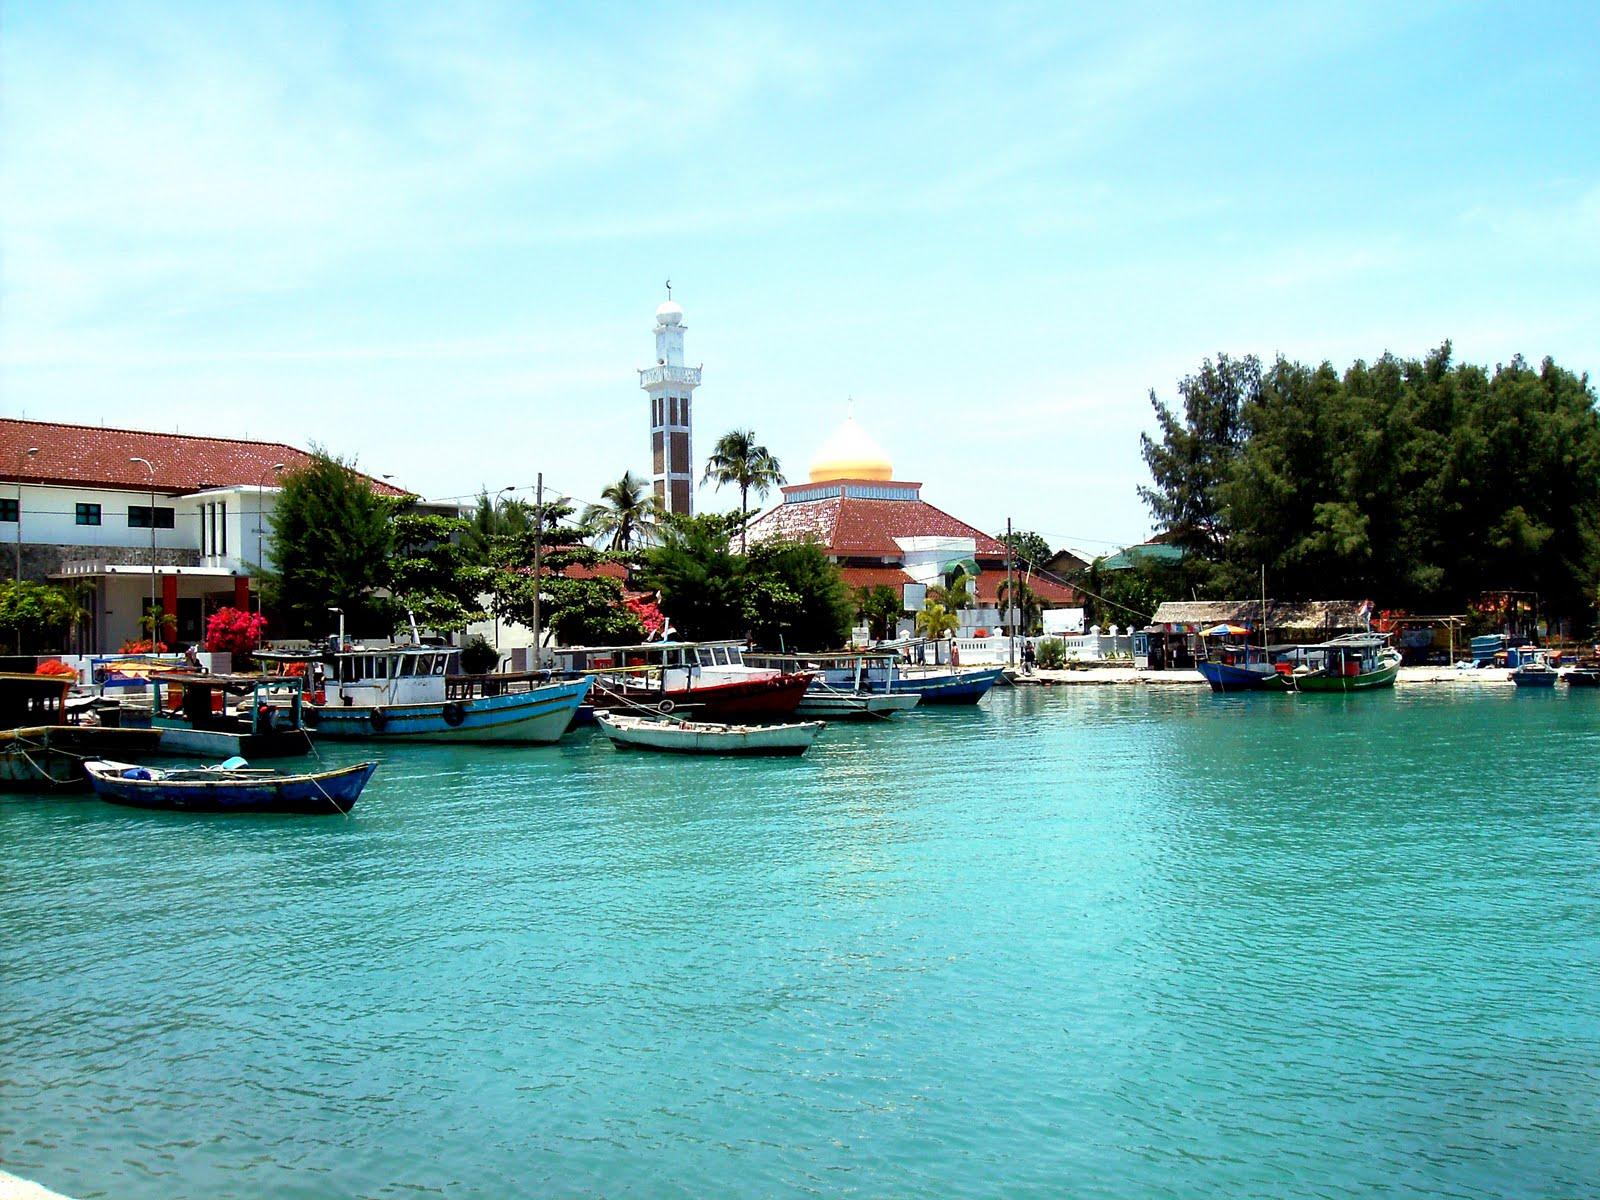 Kalau Kamu Liburan Ke Kepulauan Seribu Pakai Jasa Travel, Kamu Akan Mendapatkan 11 Fasilitas Ini. Kalau Enggak, Mendingan Cari Travel Lain Deh